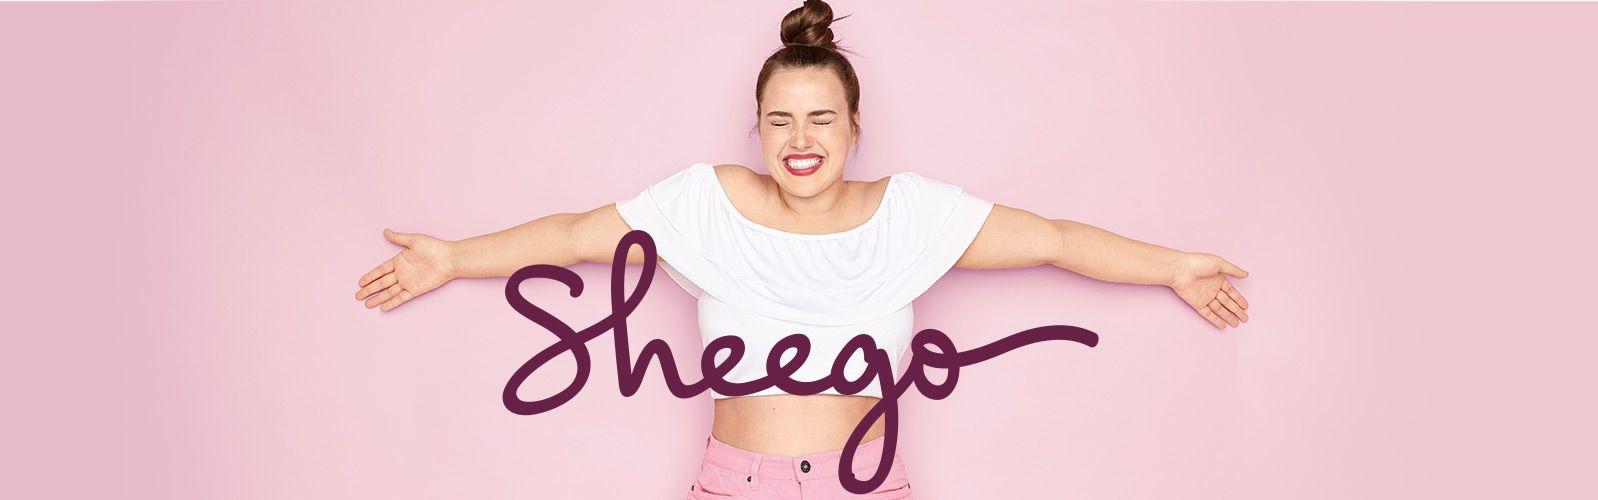 sheego Mode